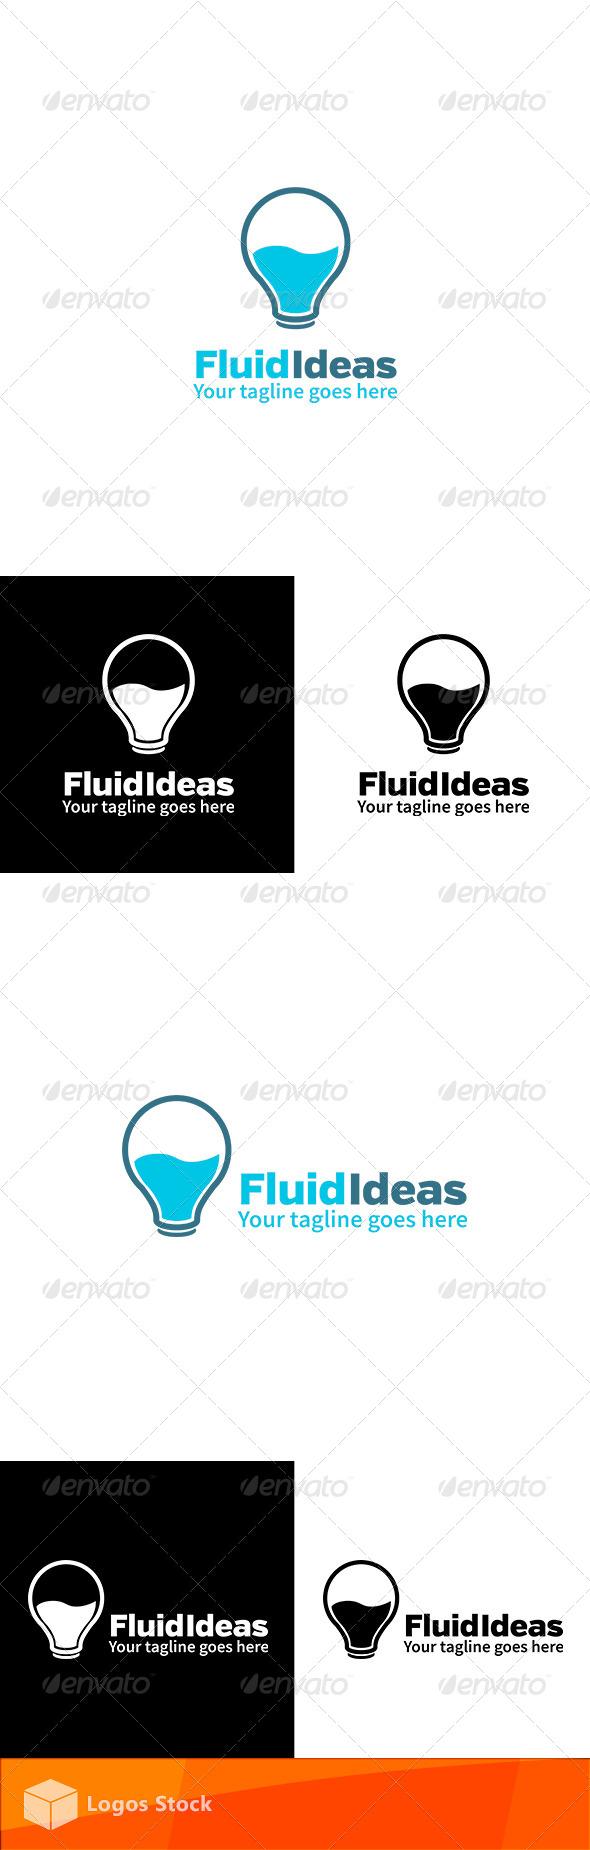 GraphicRiver Creative Logo Fluid Ideas 4174702